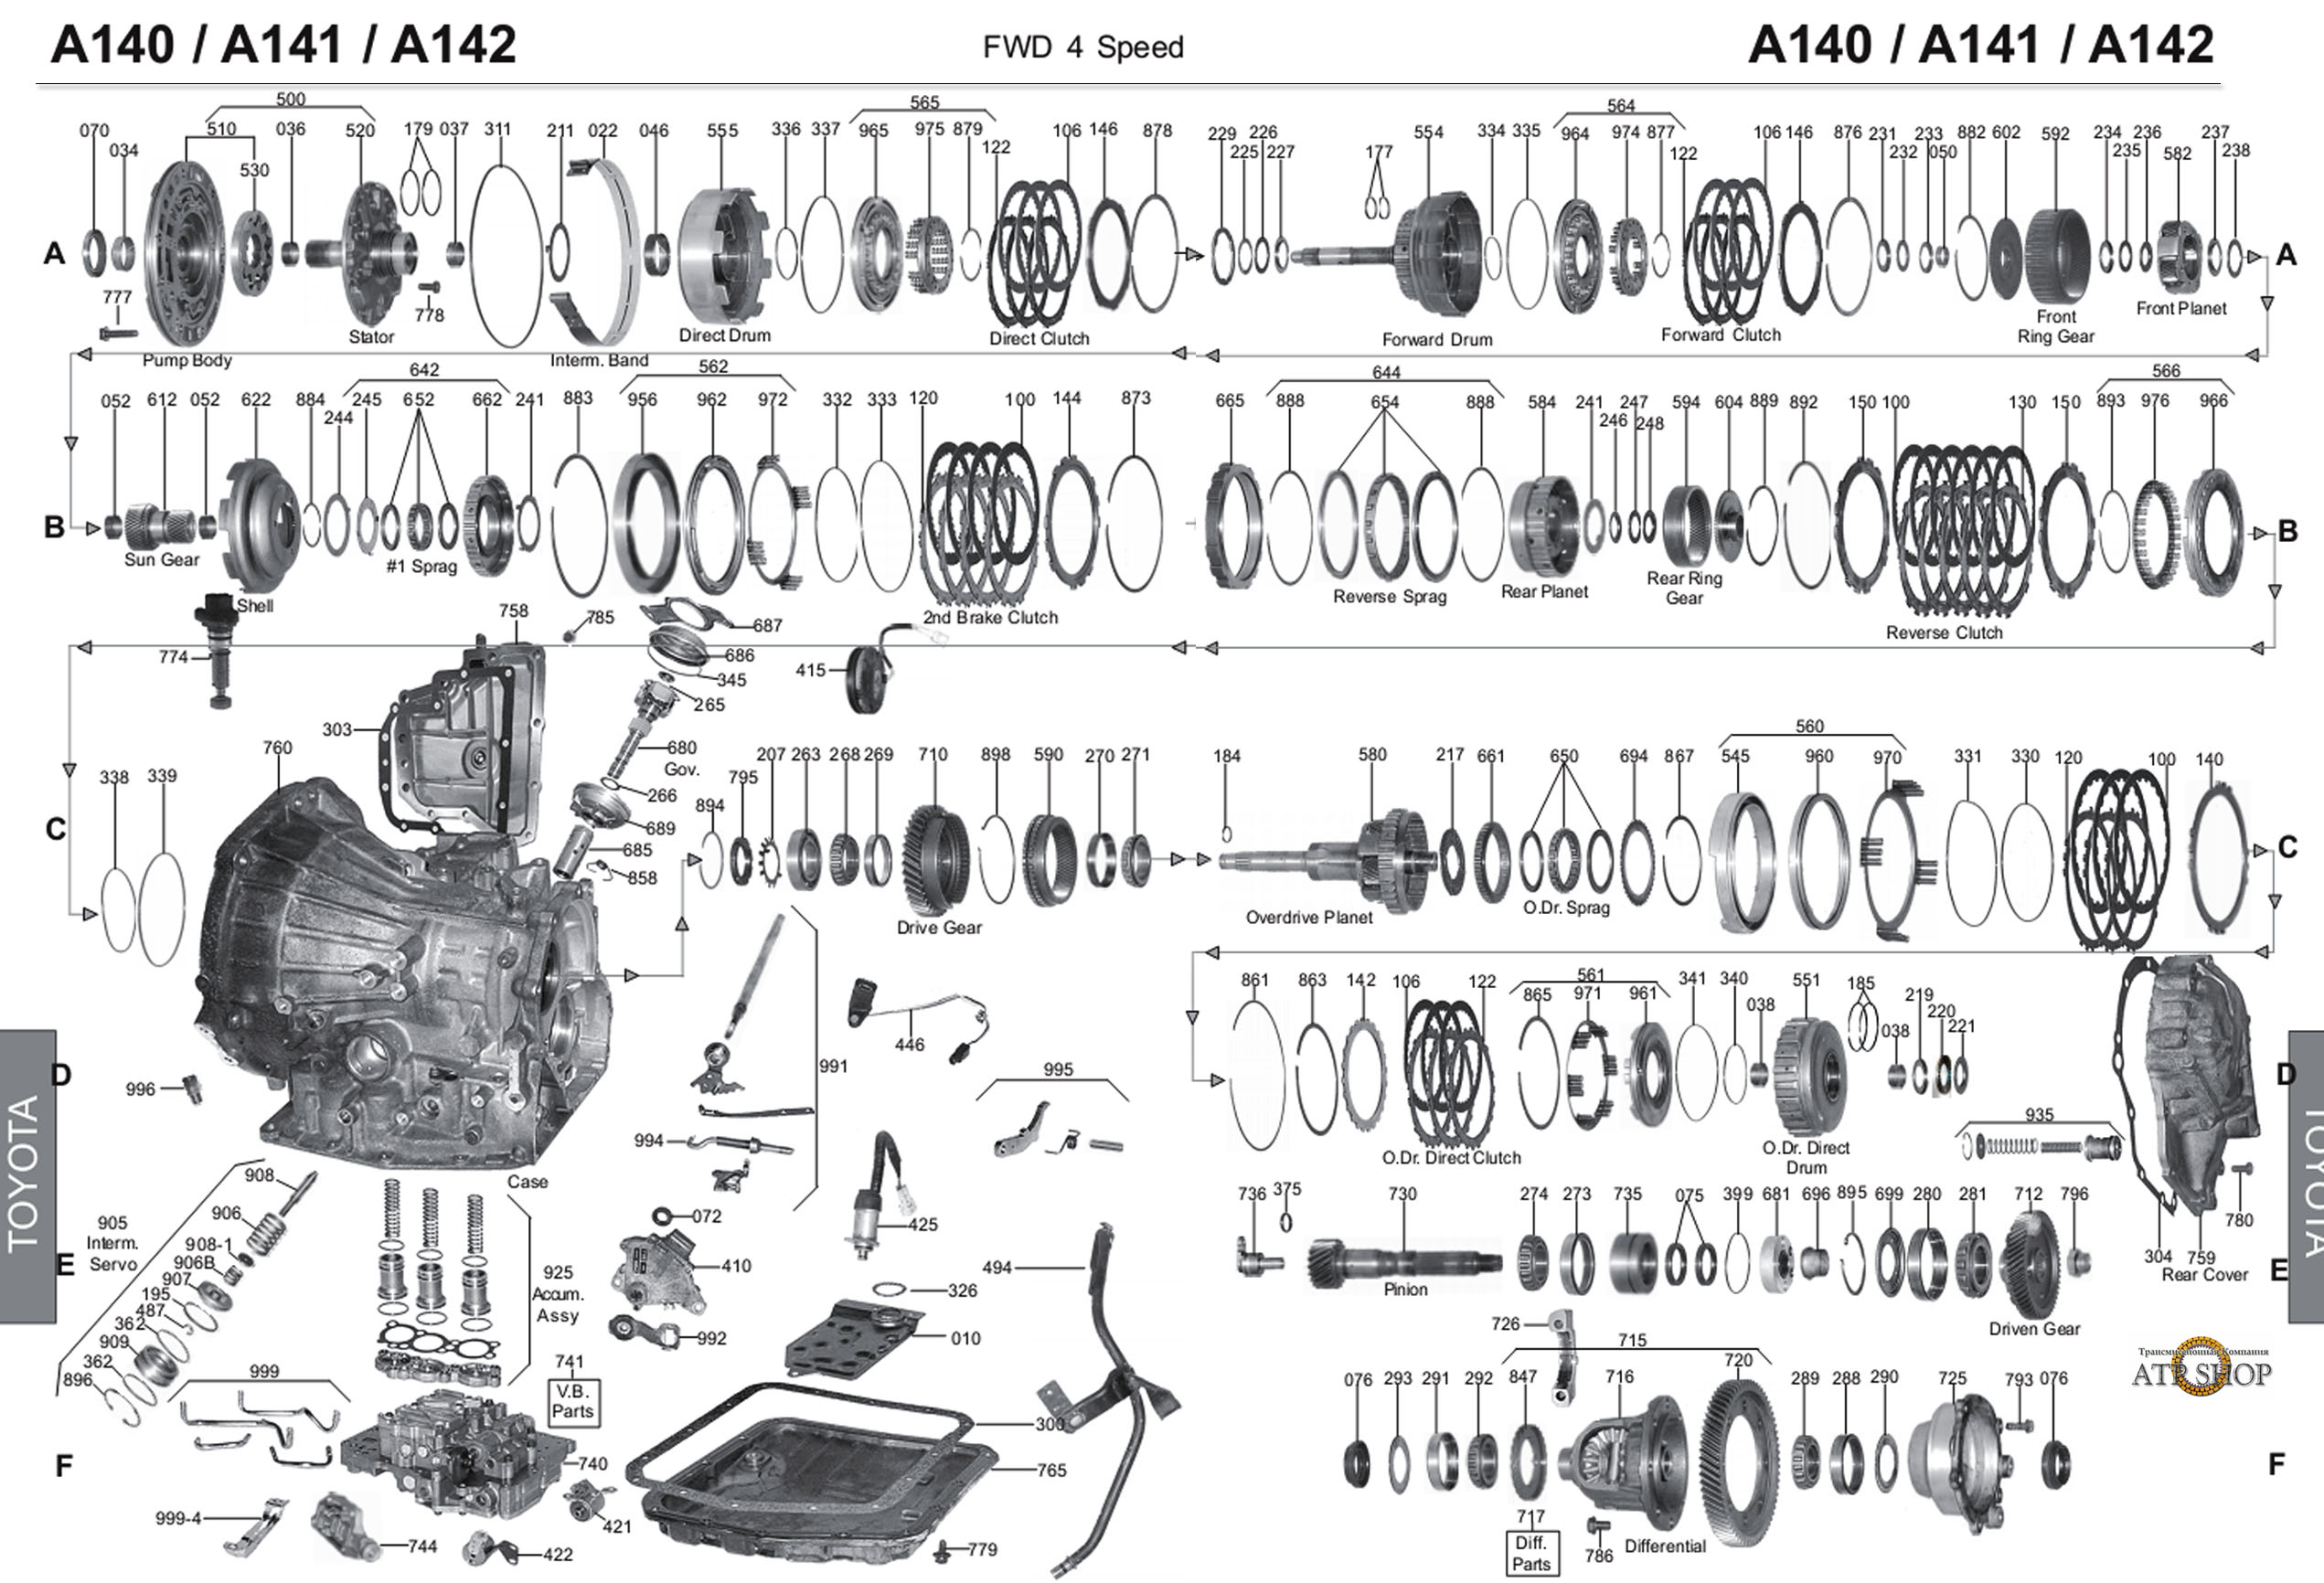 схема разъема соленоидов 3 контакта акпп тойота a240e